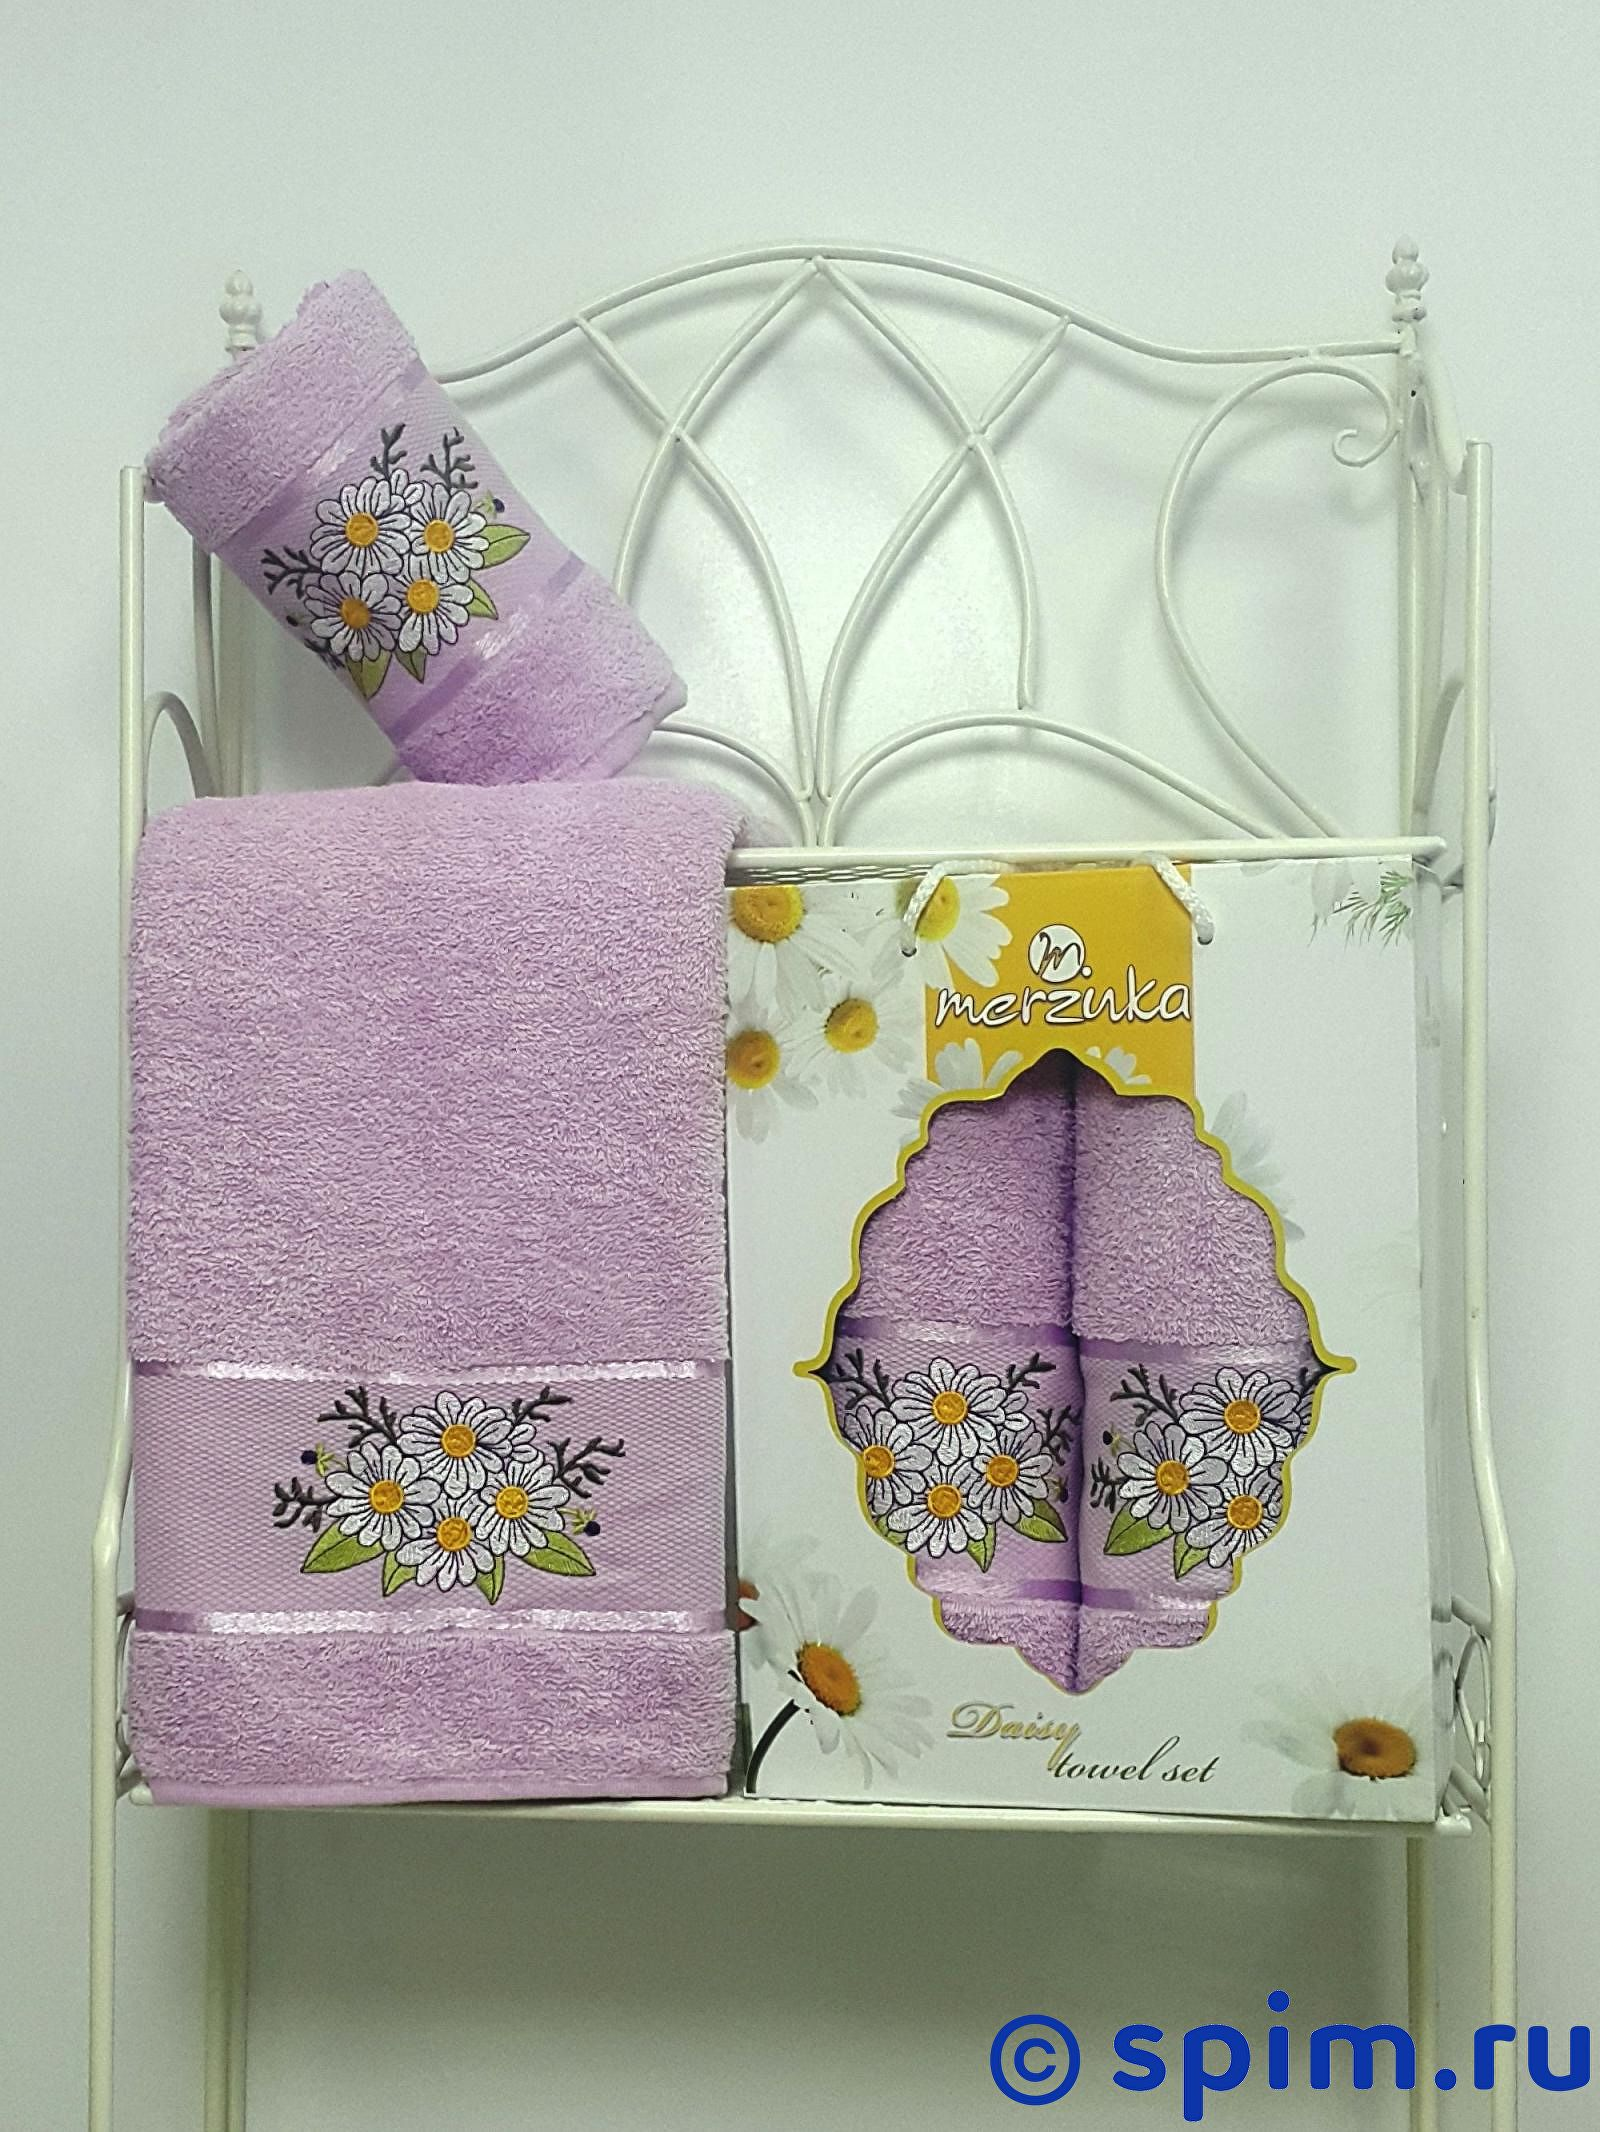 Комплект из 2-х полотенец Merzuka Daisy 8977 бежевый daisy махра 50х90 70х130 в коробке набор полотенец merzuka